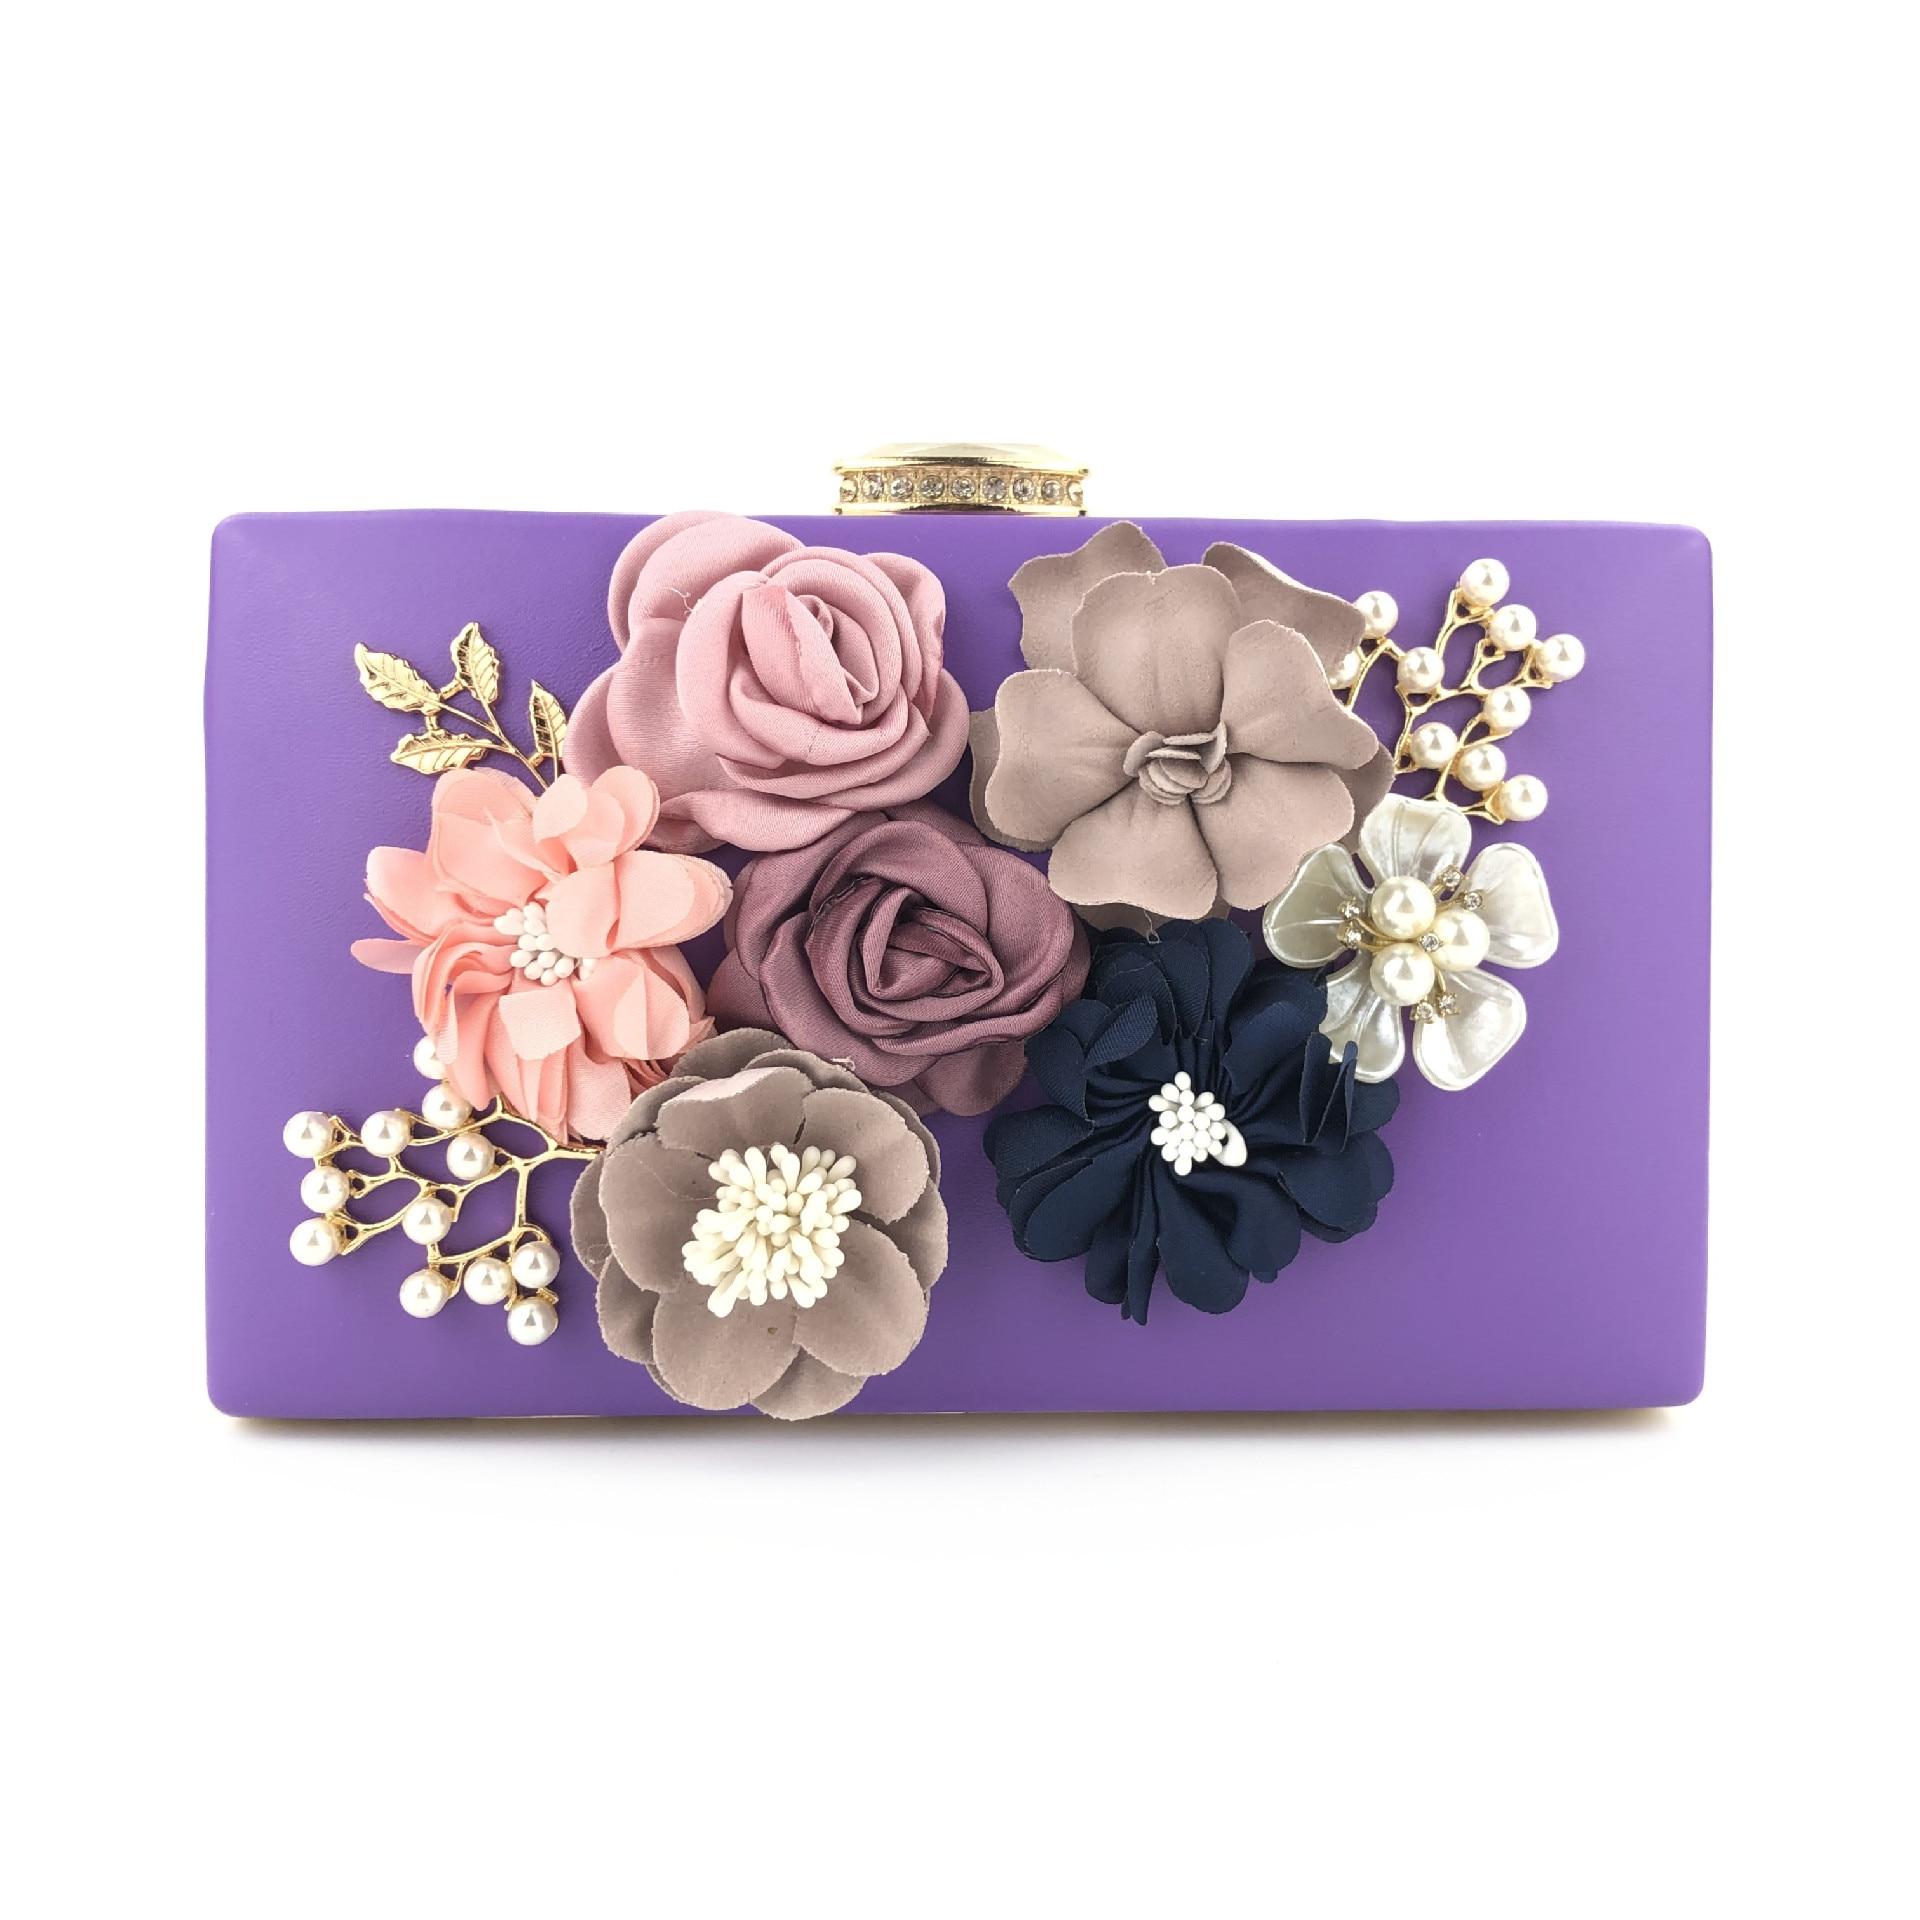 XIYUAN Women Flower Evening Bags Wedding Party Bridal Beaded clutch Purse Crystal Clutch Handbag Bolso Fiesta Mujer evening bag|Top-Handle Bags| - AliExpress